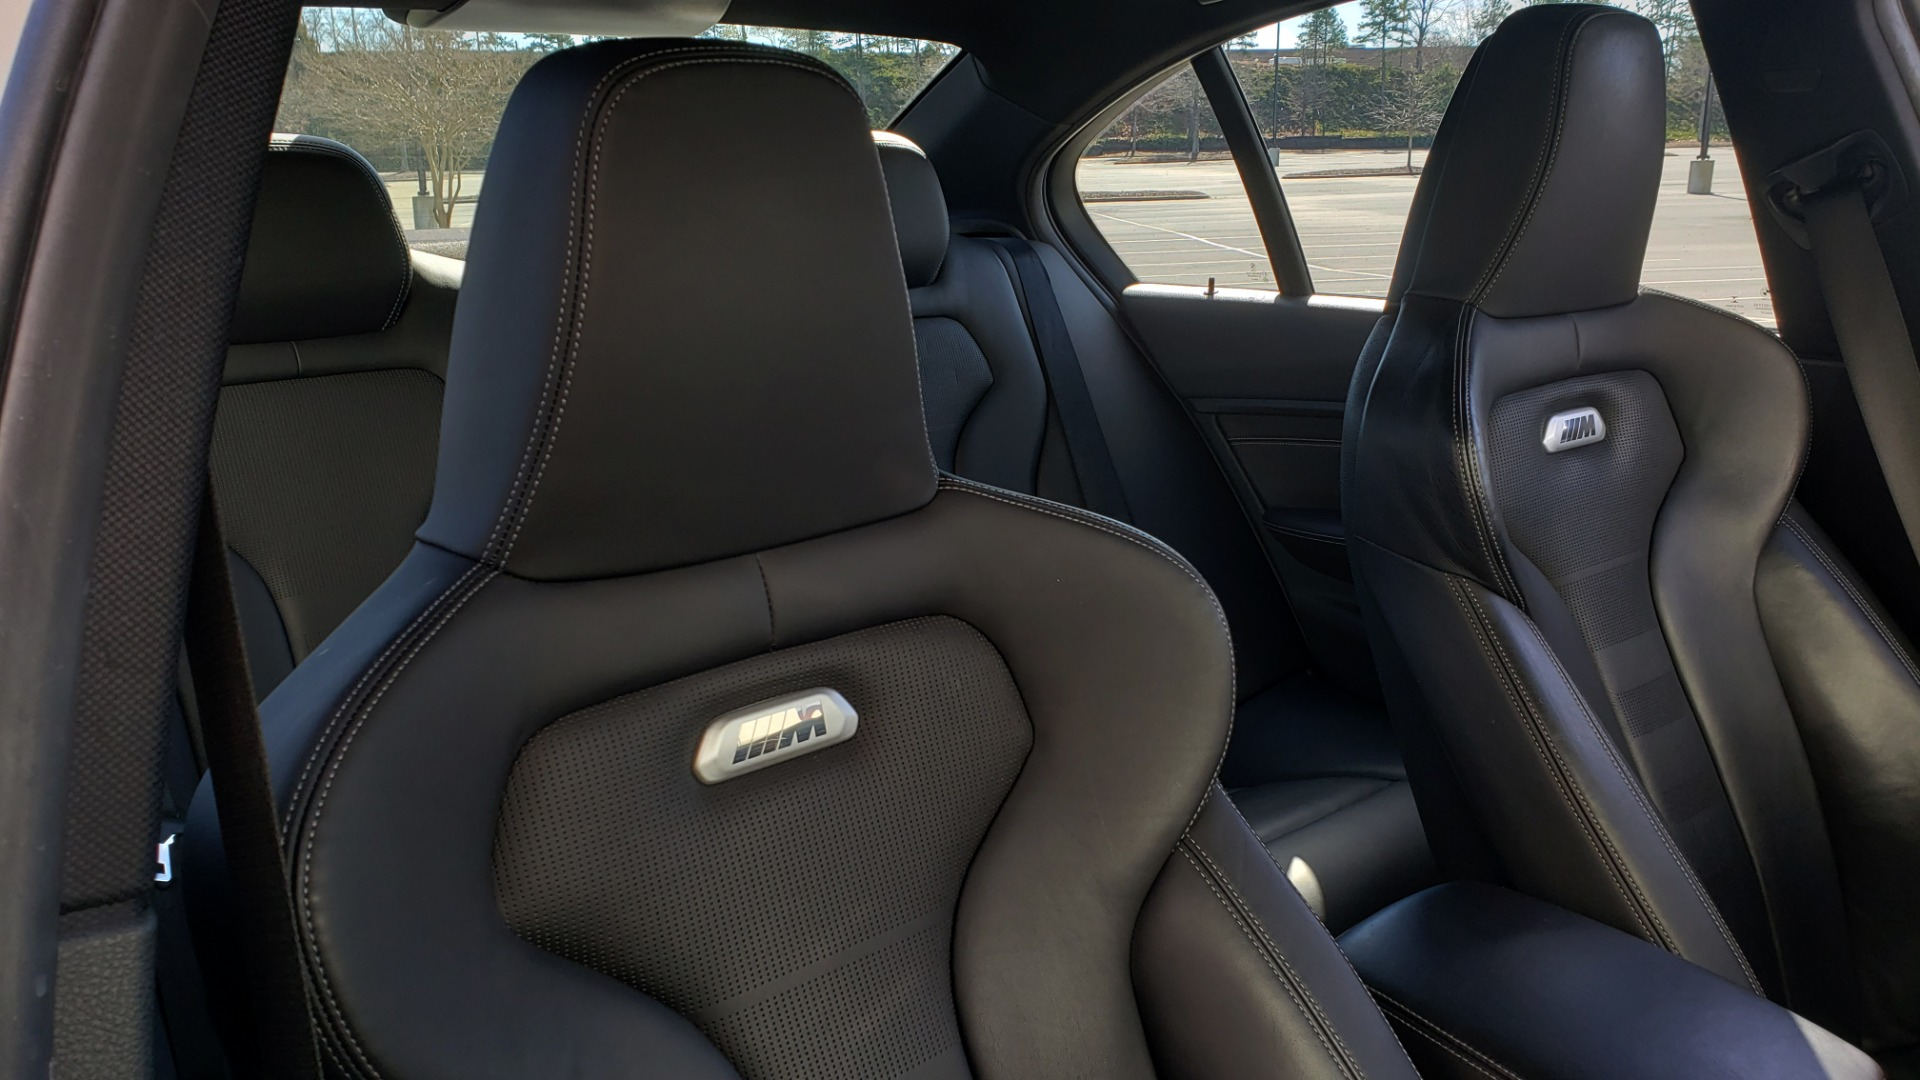 Used 2016 BMW M3 SEDAN / EXECUTIVE PKG / M-SUSPENSION / HARMAN/KARDON SOUND for sale Sold at Formula Imports in Charlotte NC 28227 69